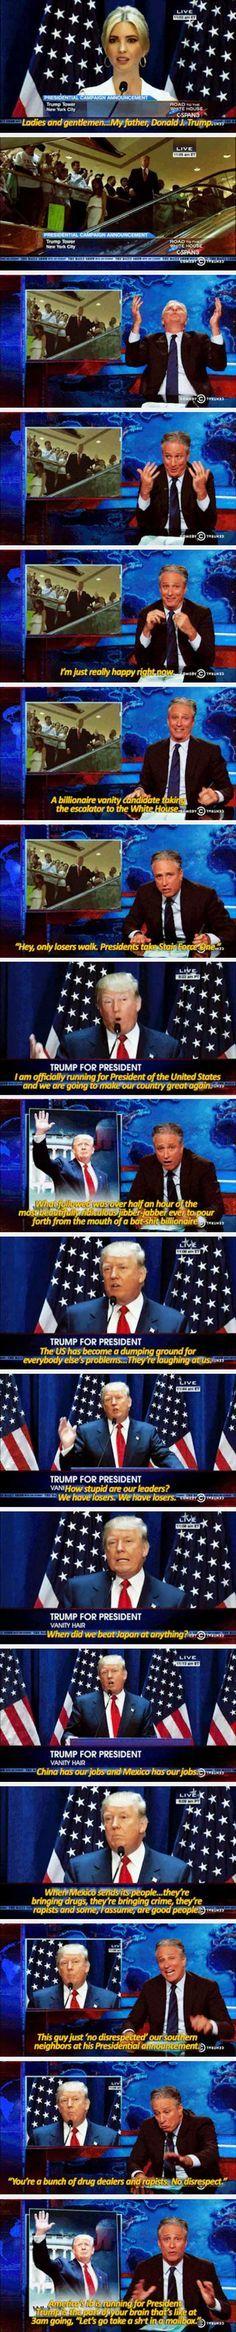 Jon Stewarts Reaction To Donald Trump Is Hilarious! – 18 Pics